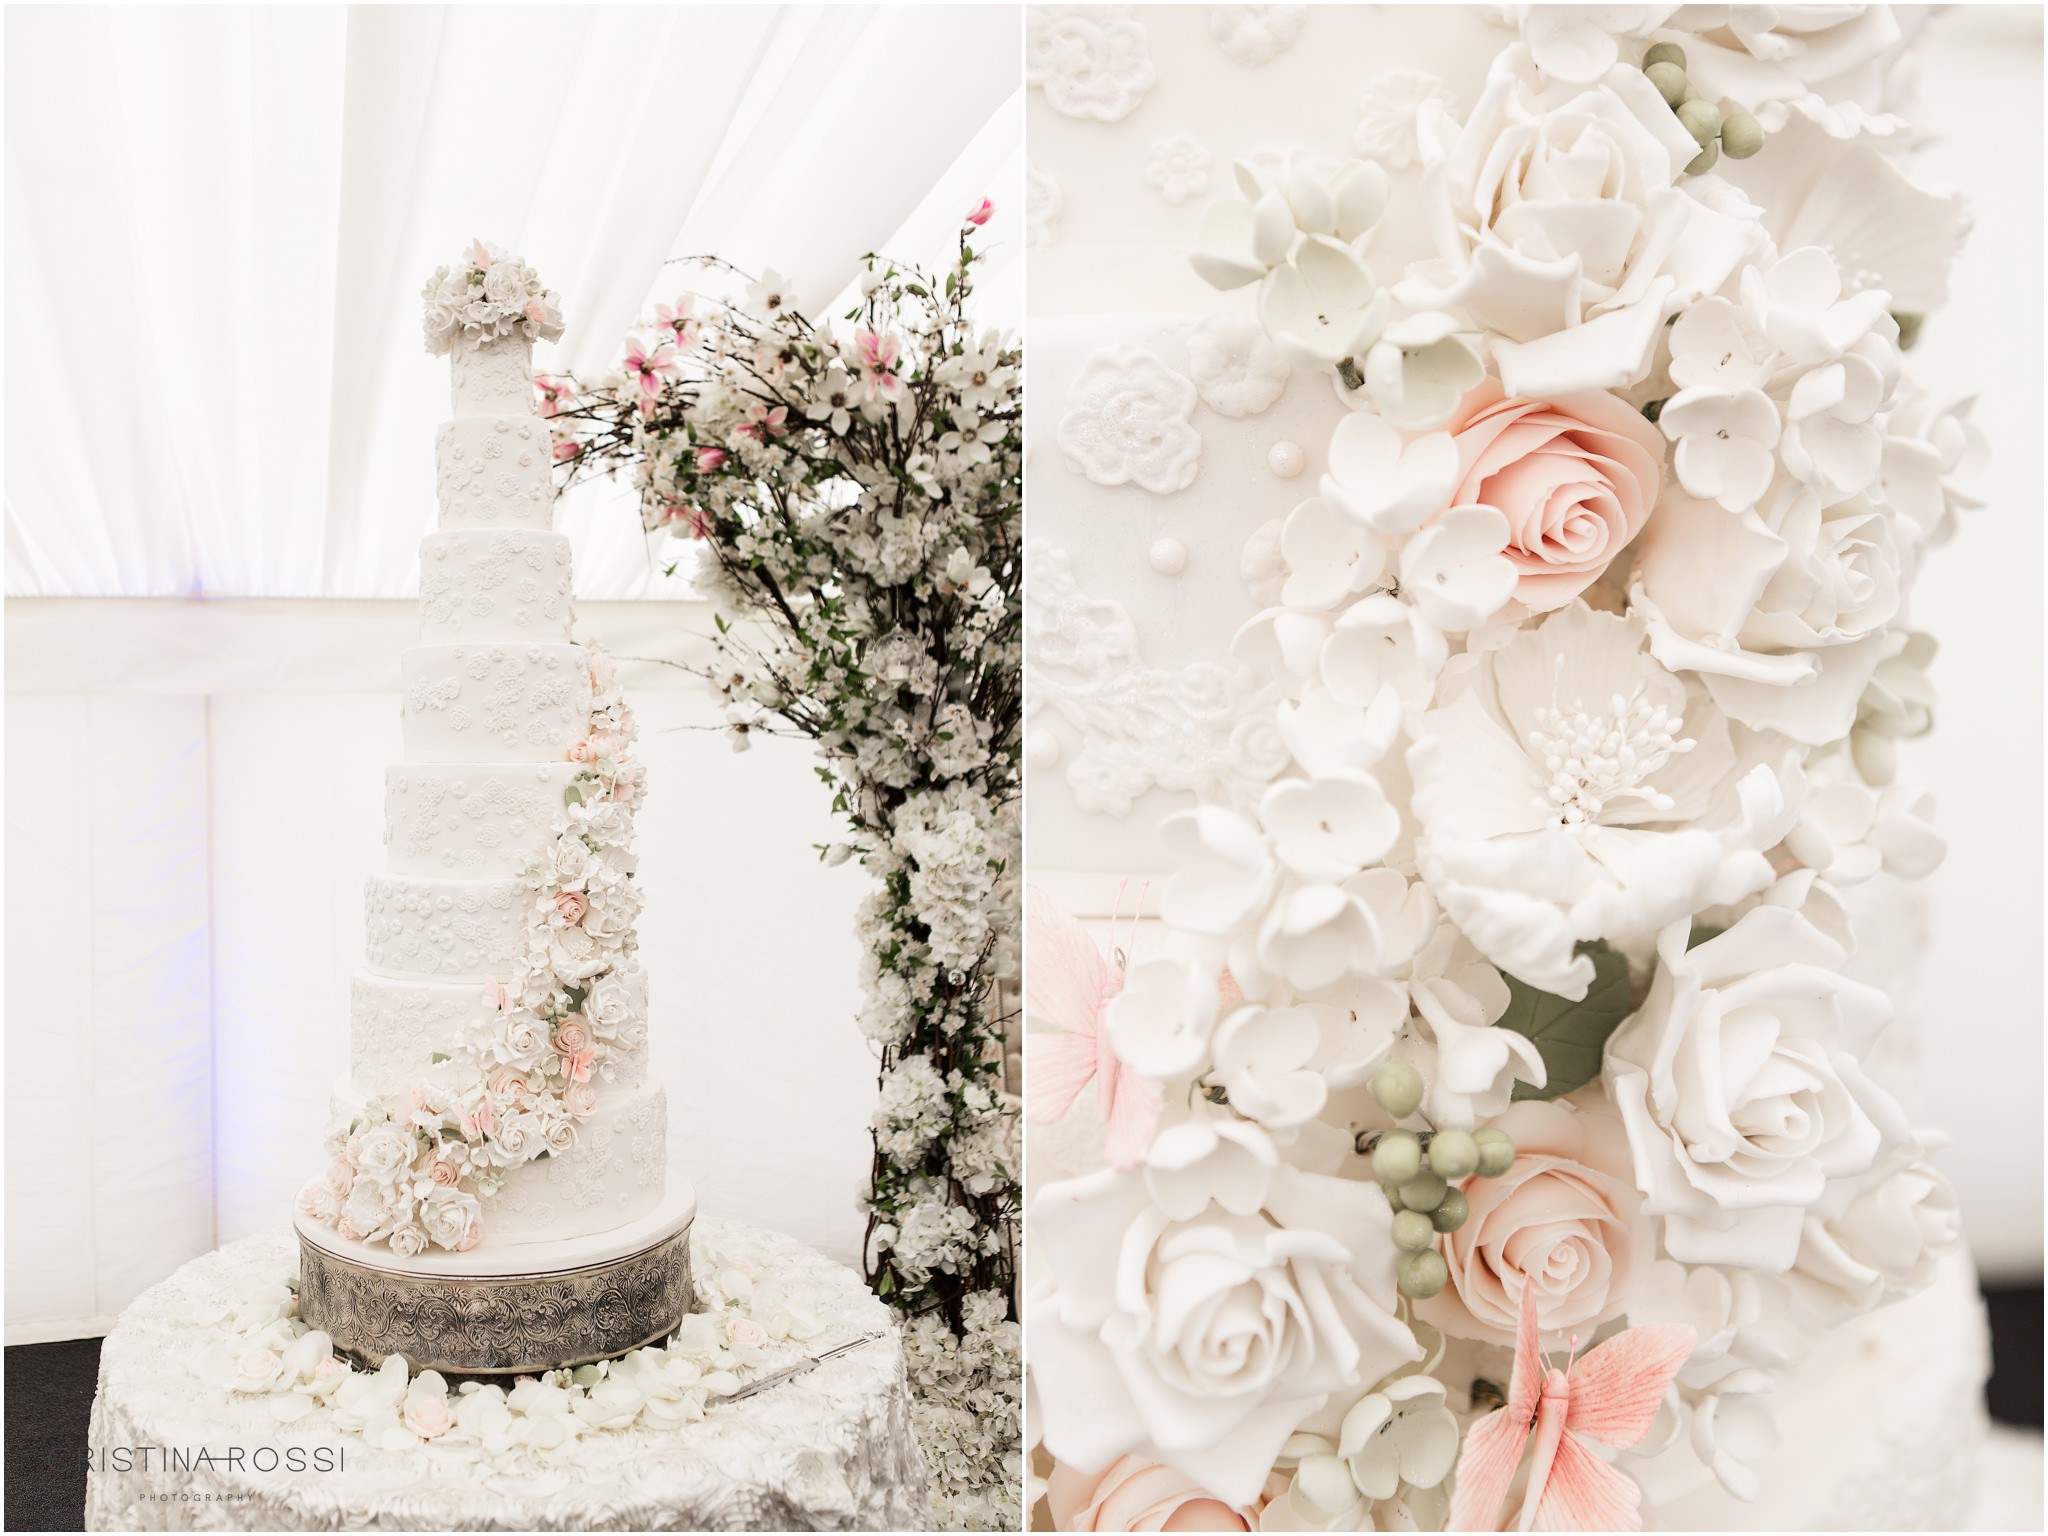 Eastwell Manor Neil Razor Ruddock & Leah Newman wedding_0092